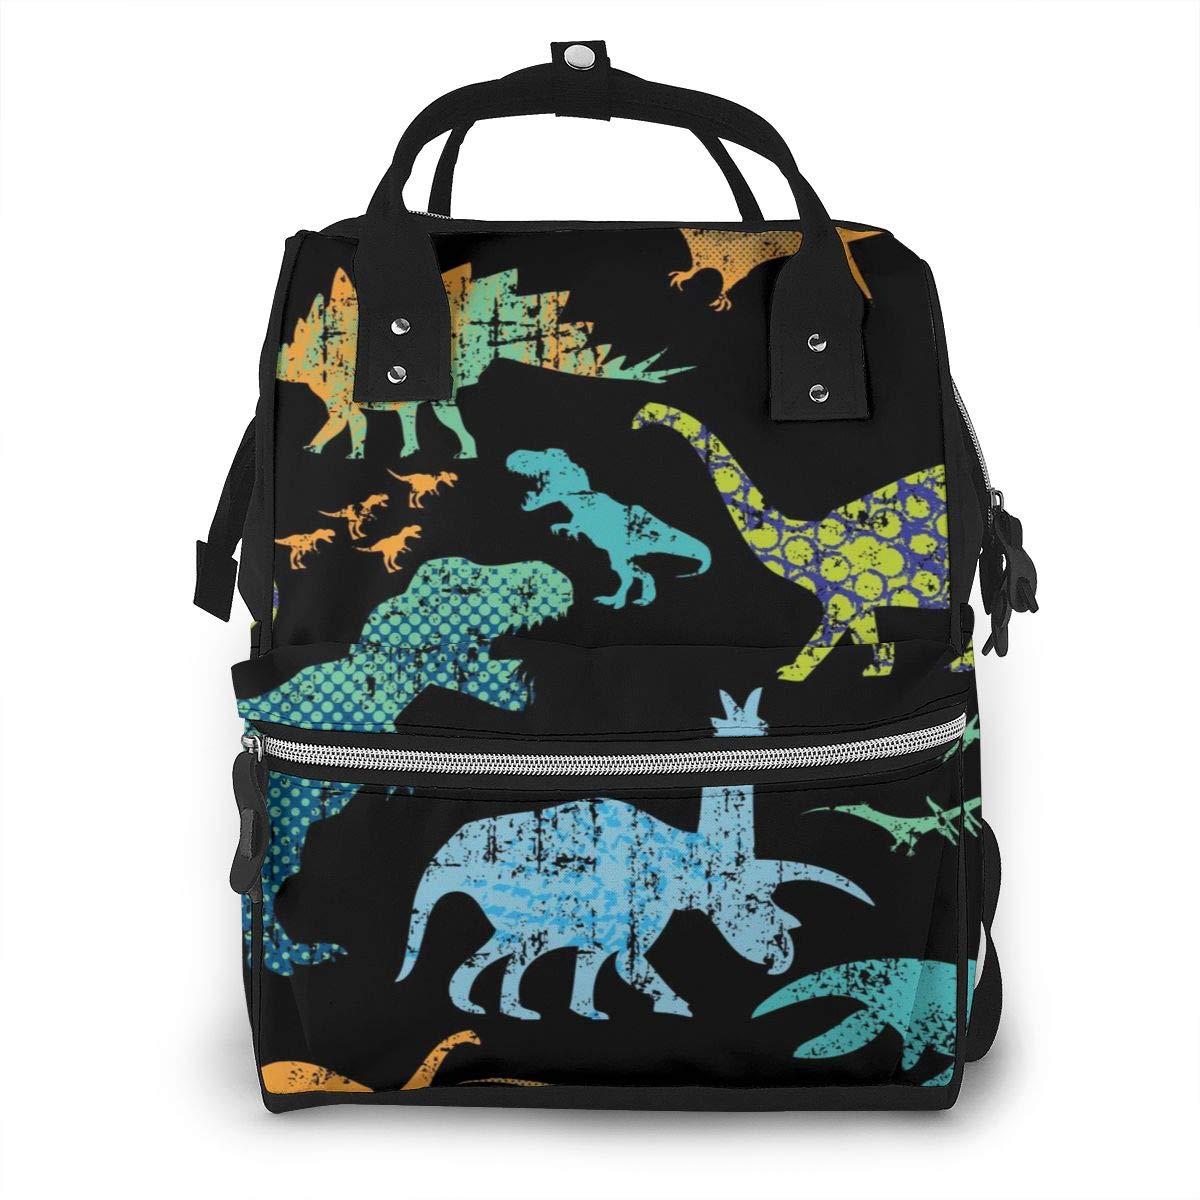 ACHOGI Dinosaur Diaper Bag Backpack, Women Large Capacity Multi Function Travel Nappy Bag for Baby Care